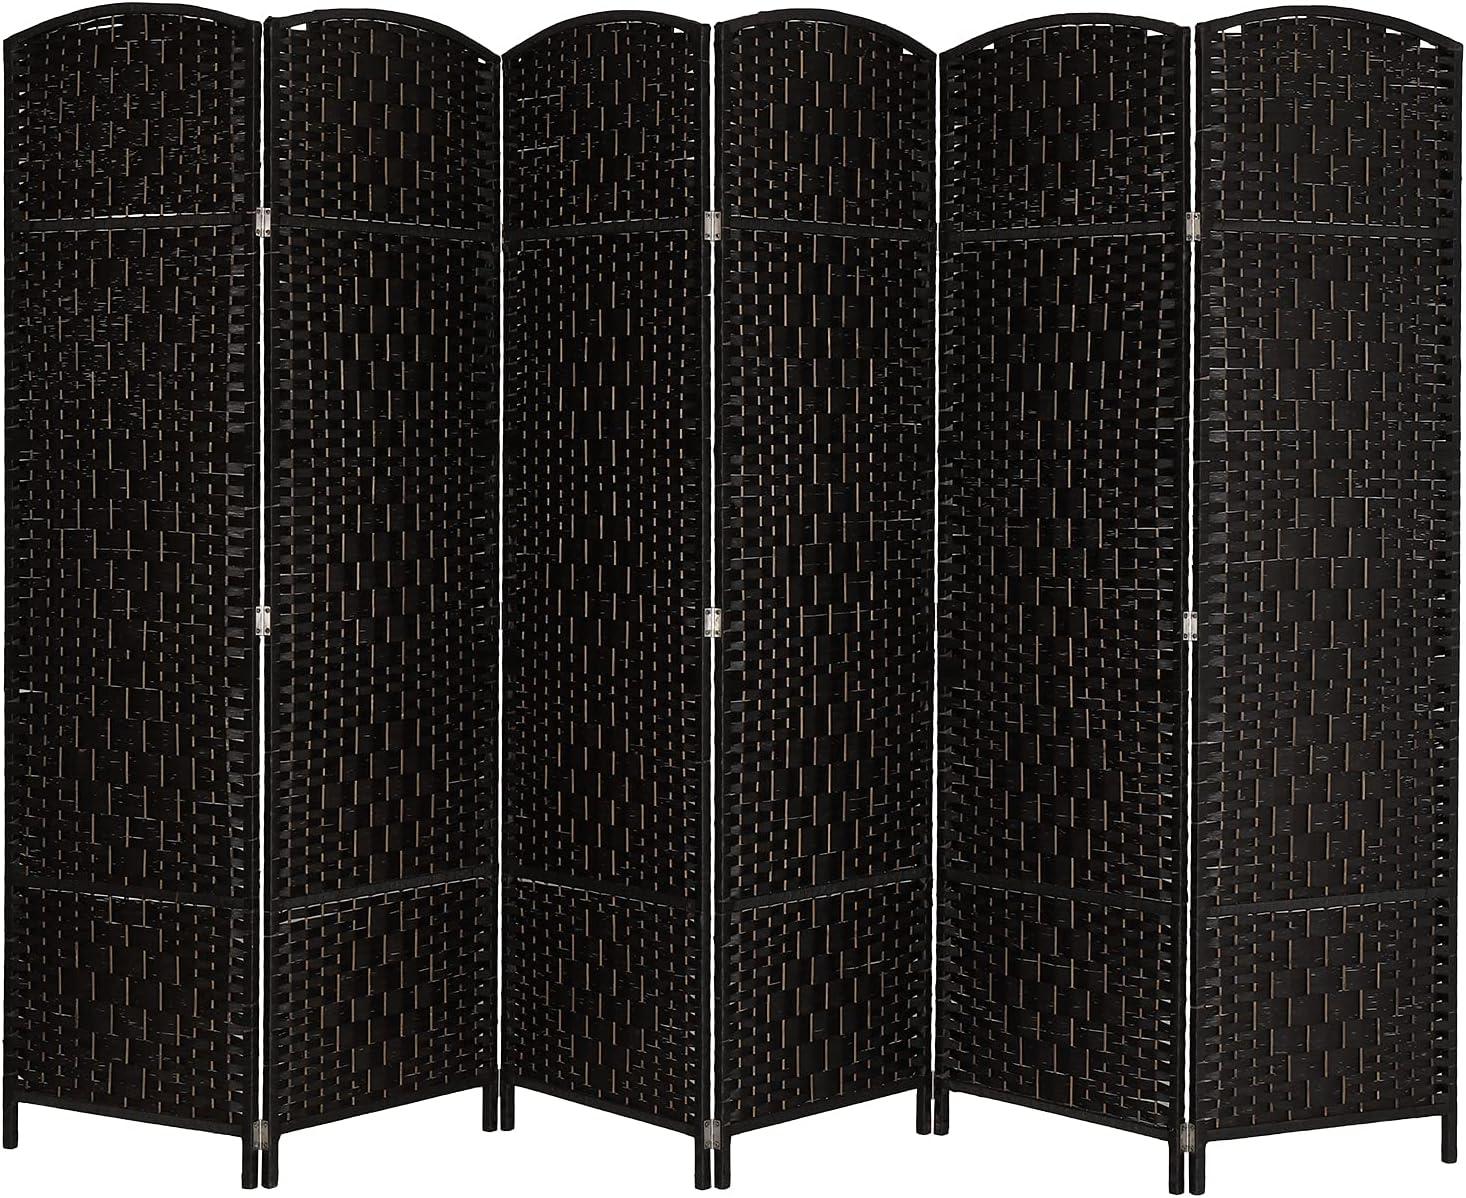 Super popular specialty store Max 55% OFF Bonnlo 6-Panel 6 FT Tall Rattan Folding Screens Divider Room Sp